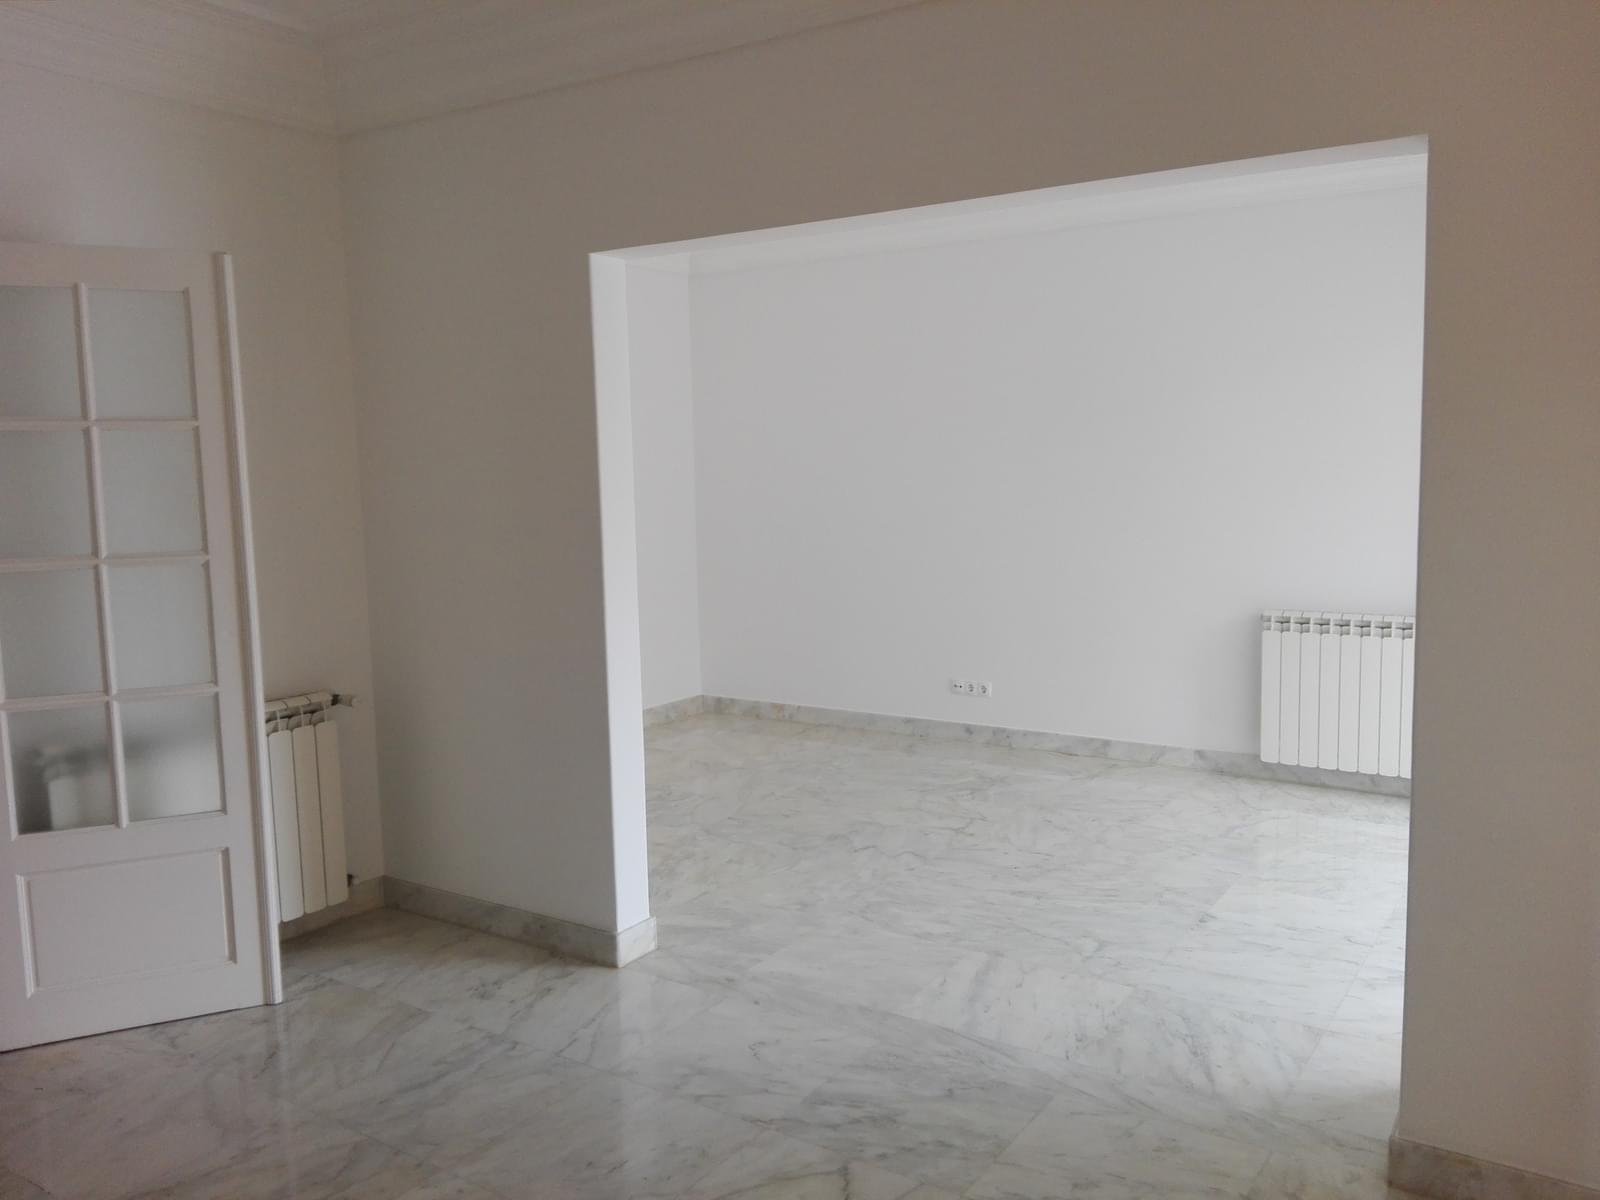 pf17056-apartamento-t4-1-lisboa-0a00ff72-bb9d-4542-b4b1-cfa75763c0e2